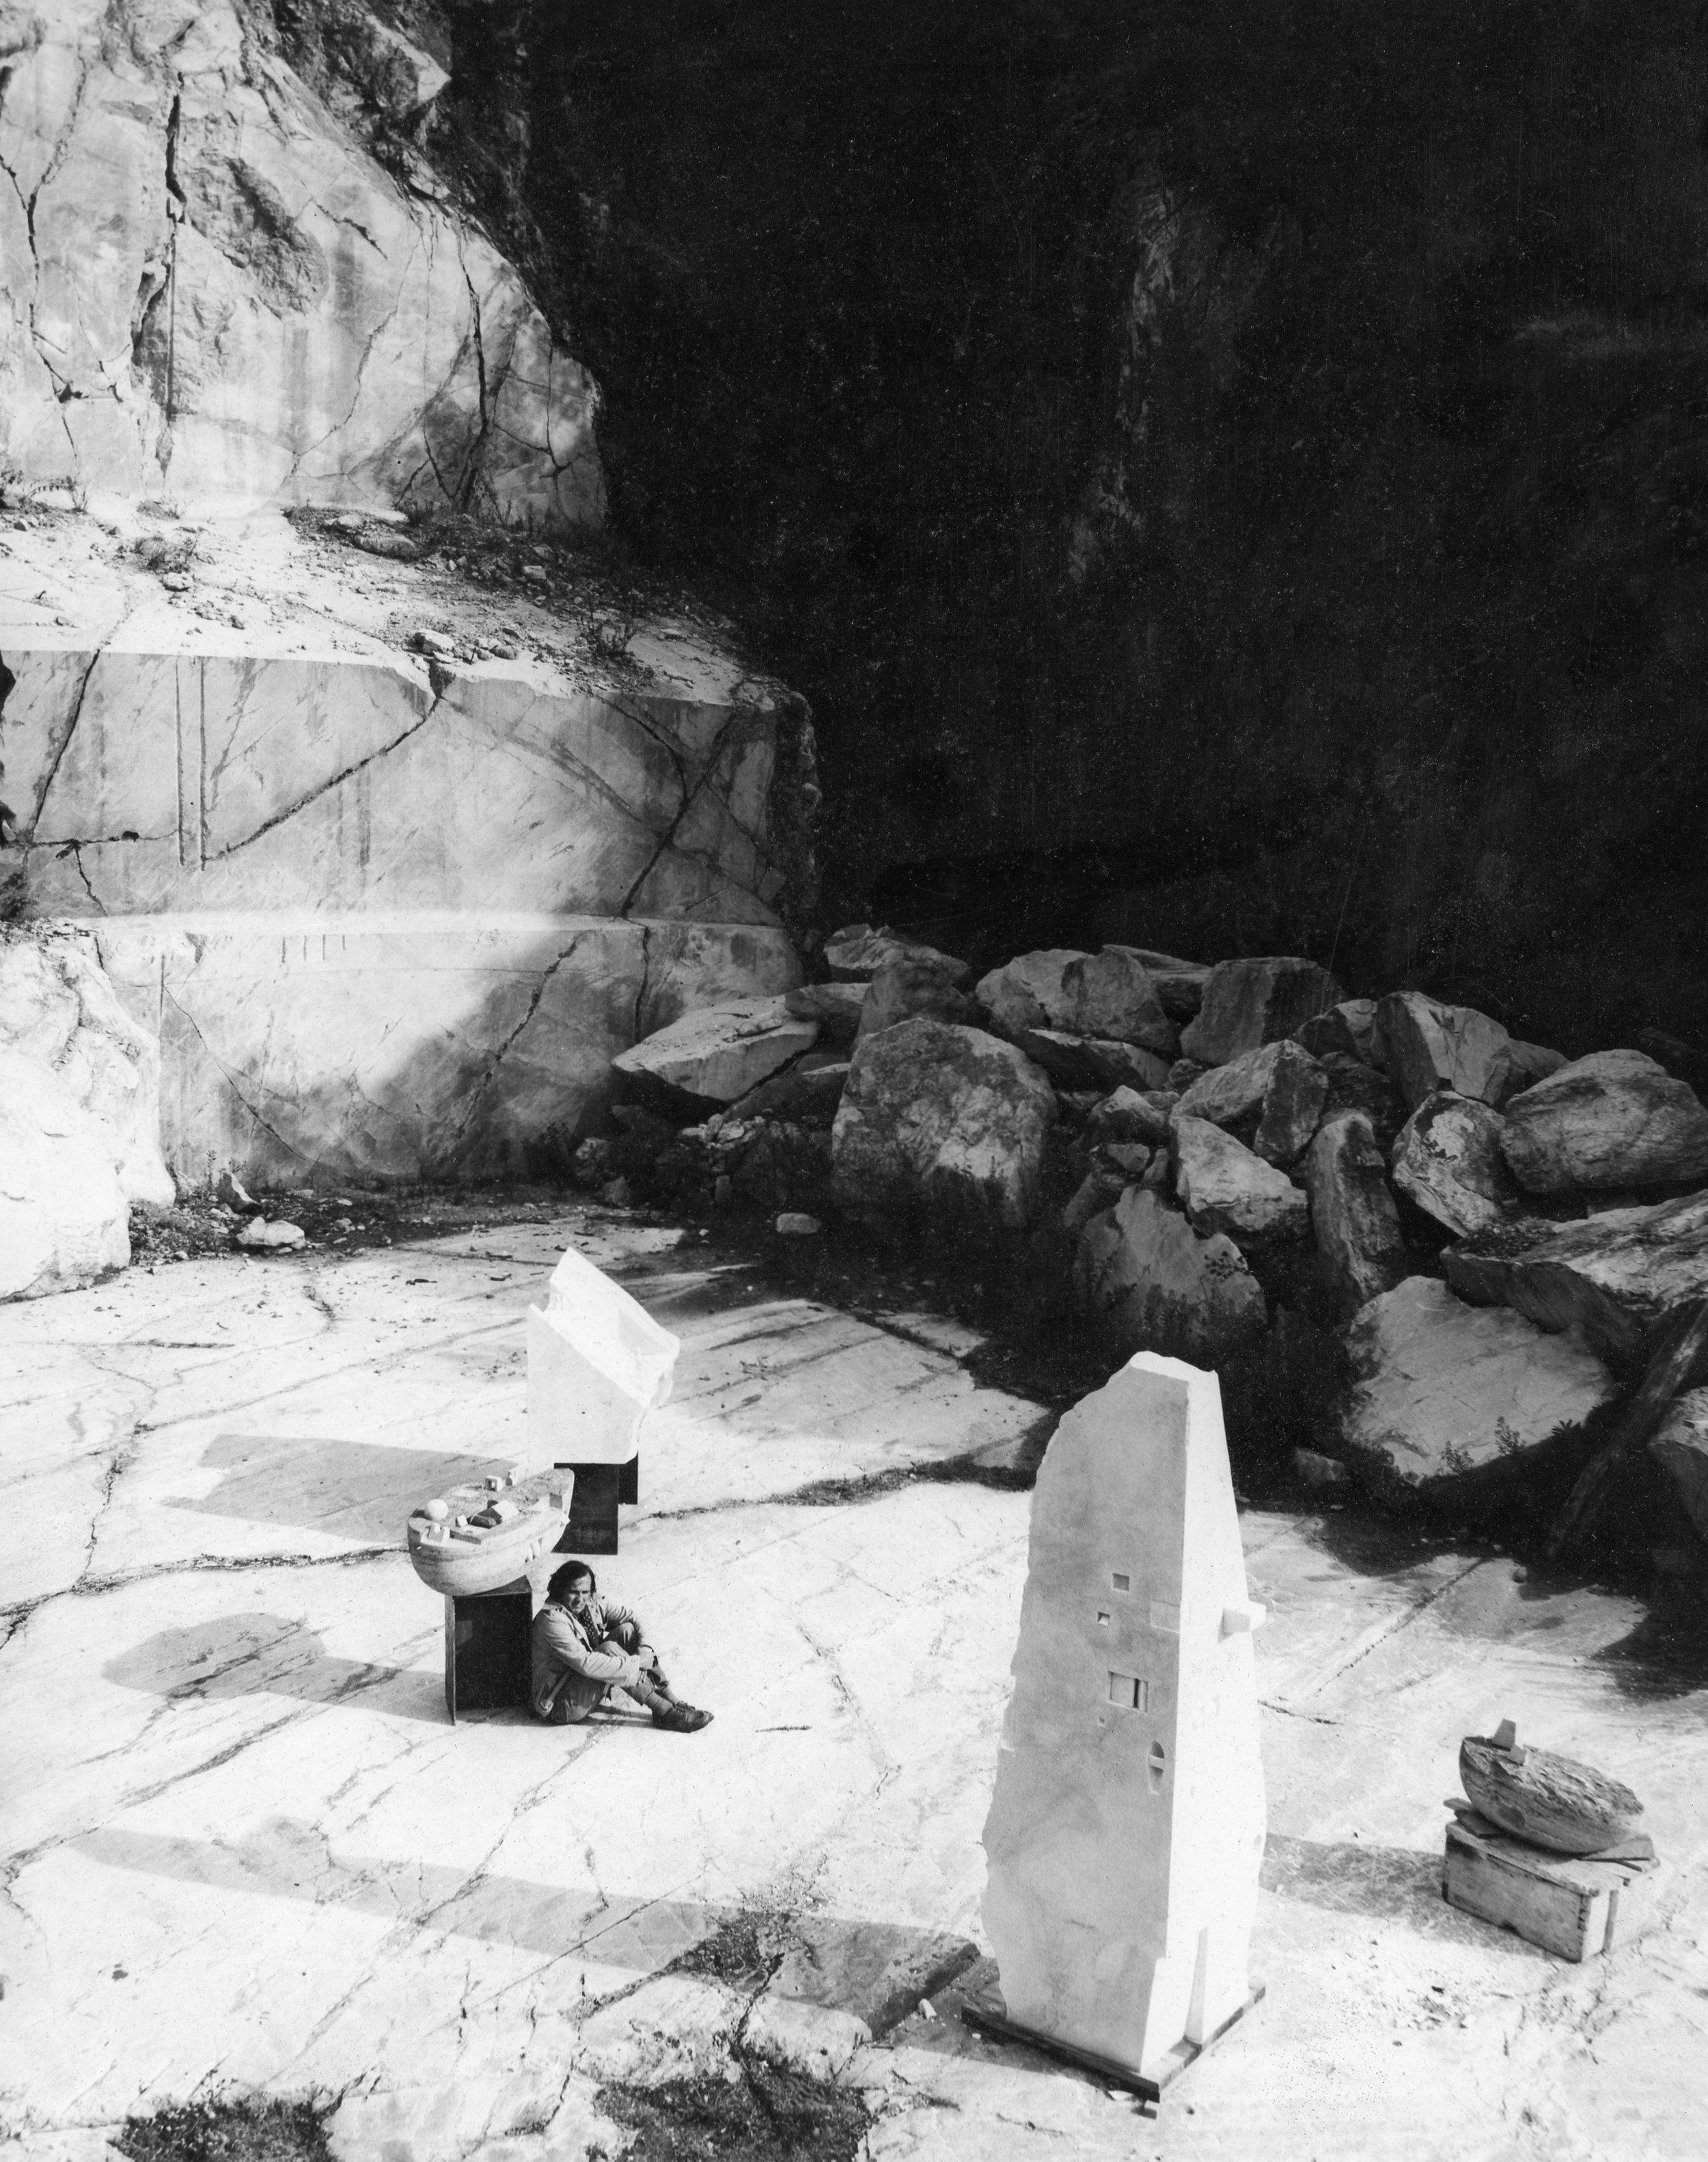 Gonzalo Fonseca in his quarry studio in Saravezza, Italy, 1979. Photo: Estate of Gonzalo Fonseca